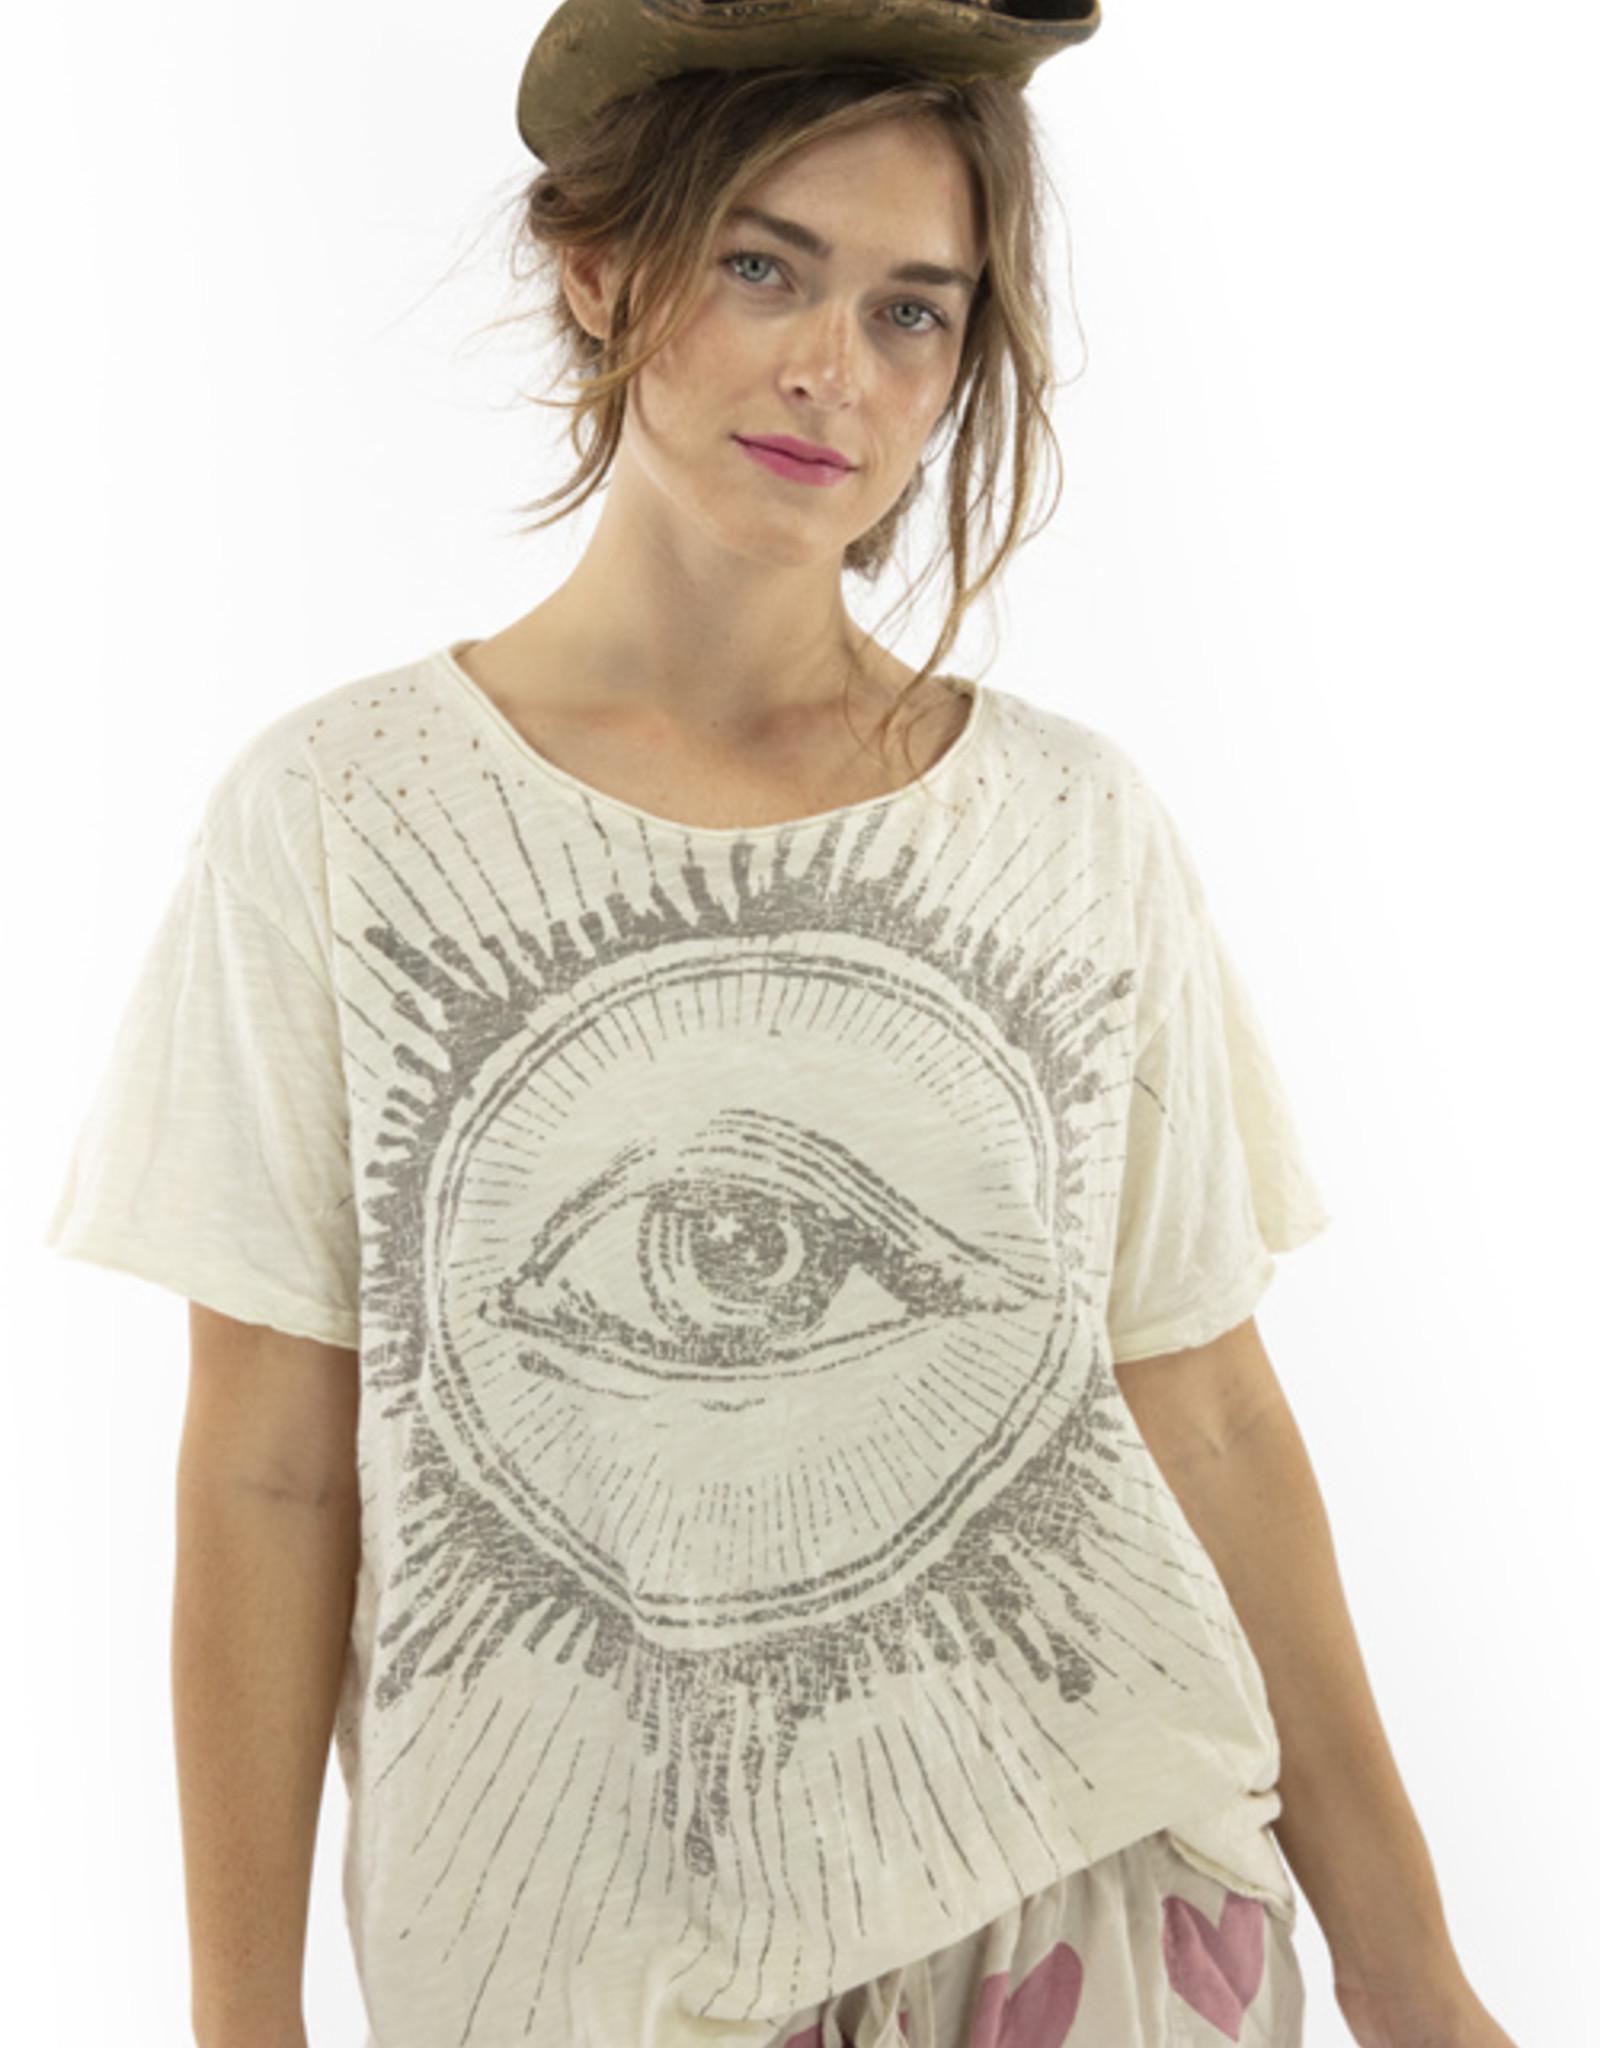 MAGNOLIA PEARL Rays of Glory T Shirt